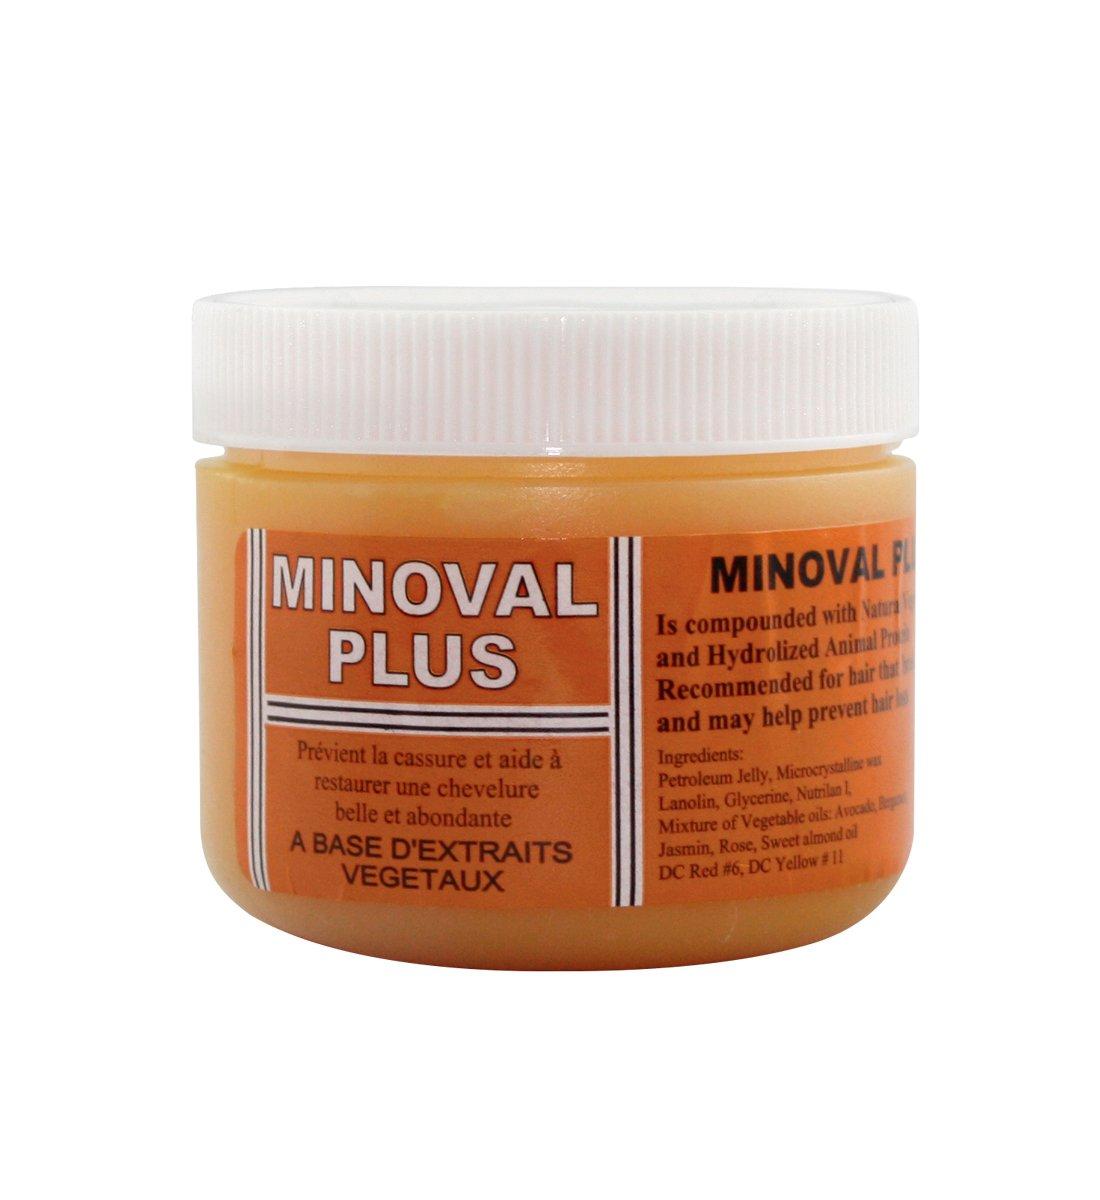 Buy Minoval Plus Hair Regrowth Treatment Serum | Benefits | | OBS